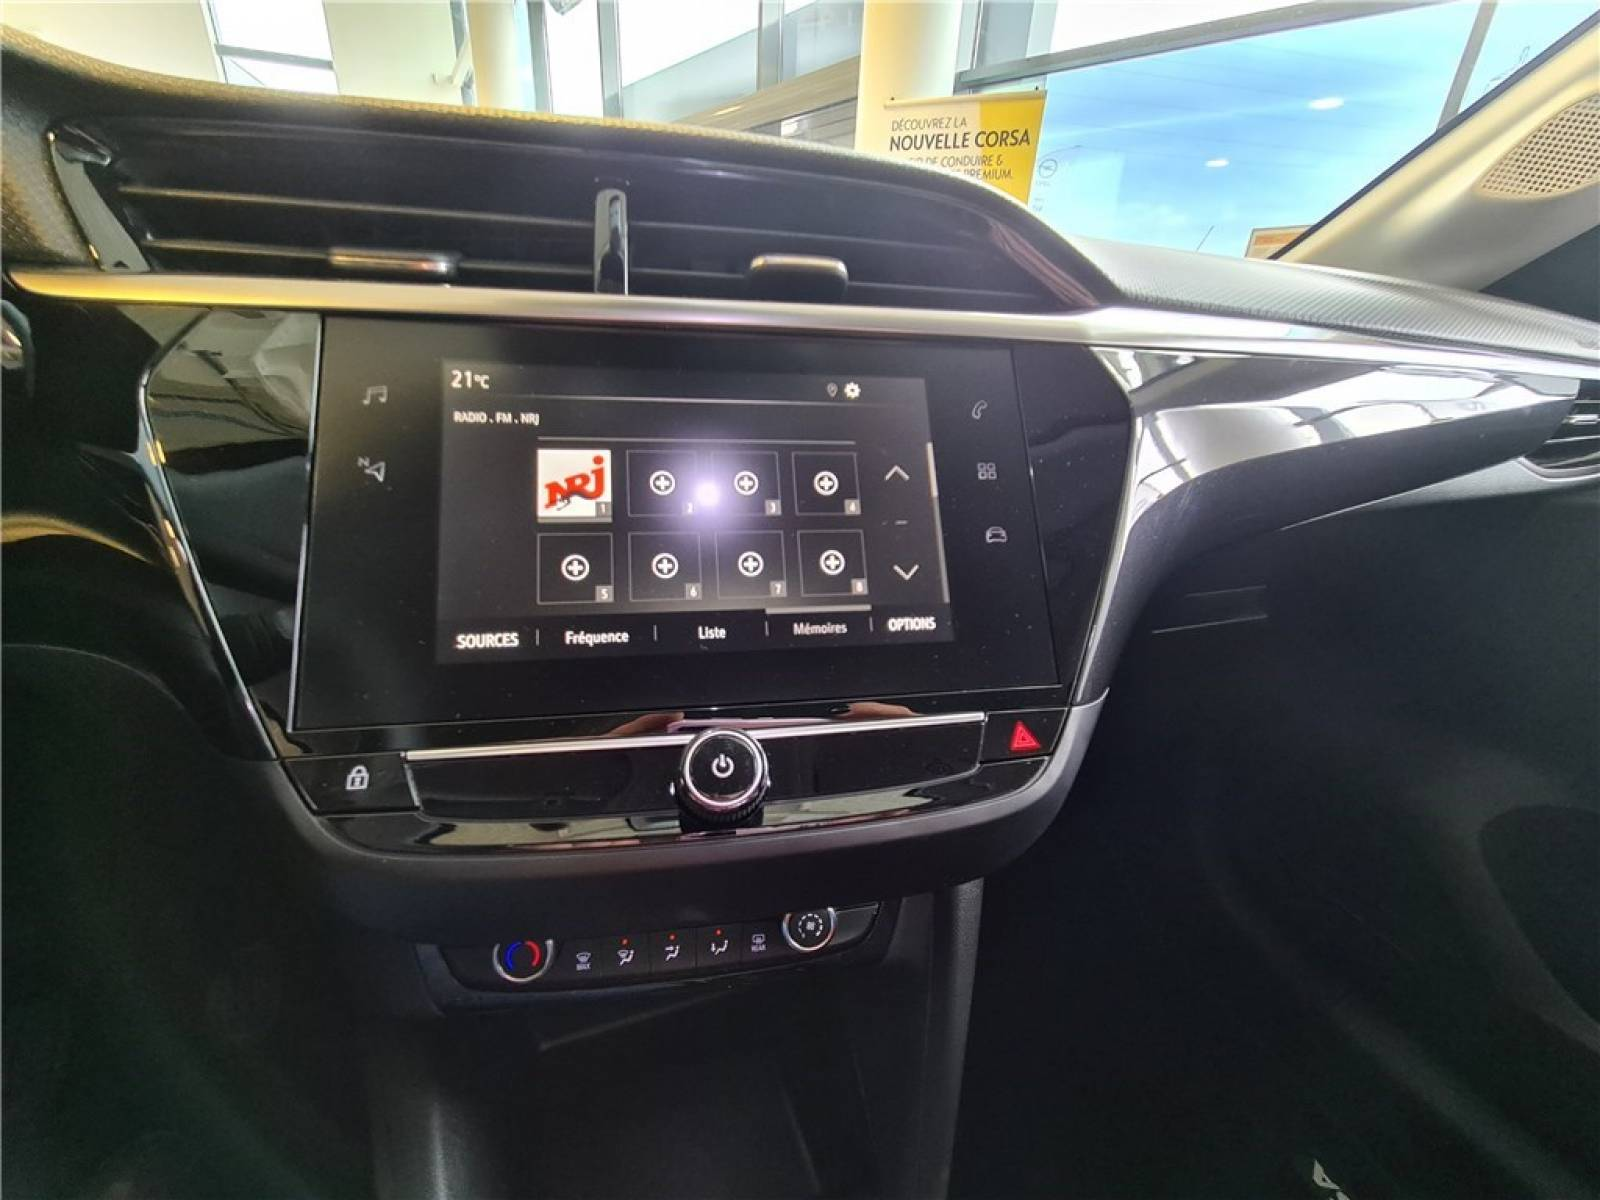 OPEL Corsa 1.2 Turbo 100 ch BVM6 - véhicule d'occasion - Groupe Guillet - Opel Magicauto - Chalon-sur-Saône - 71380 - Saint-Marcel - 28